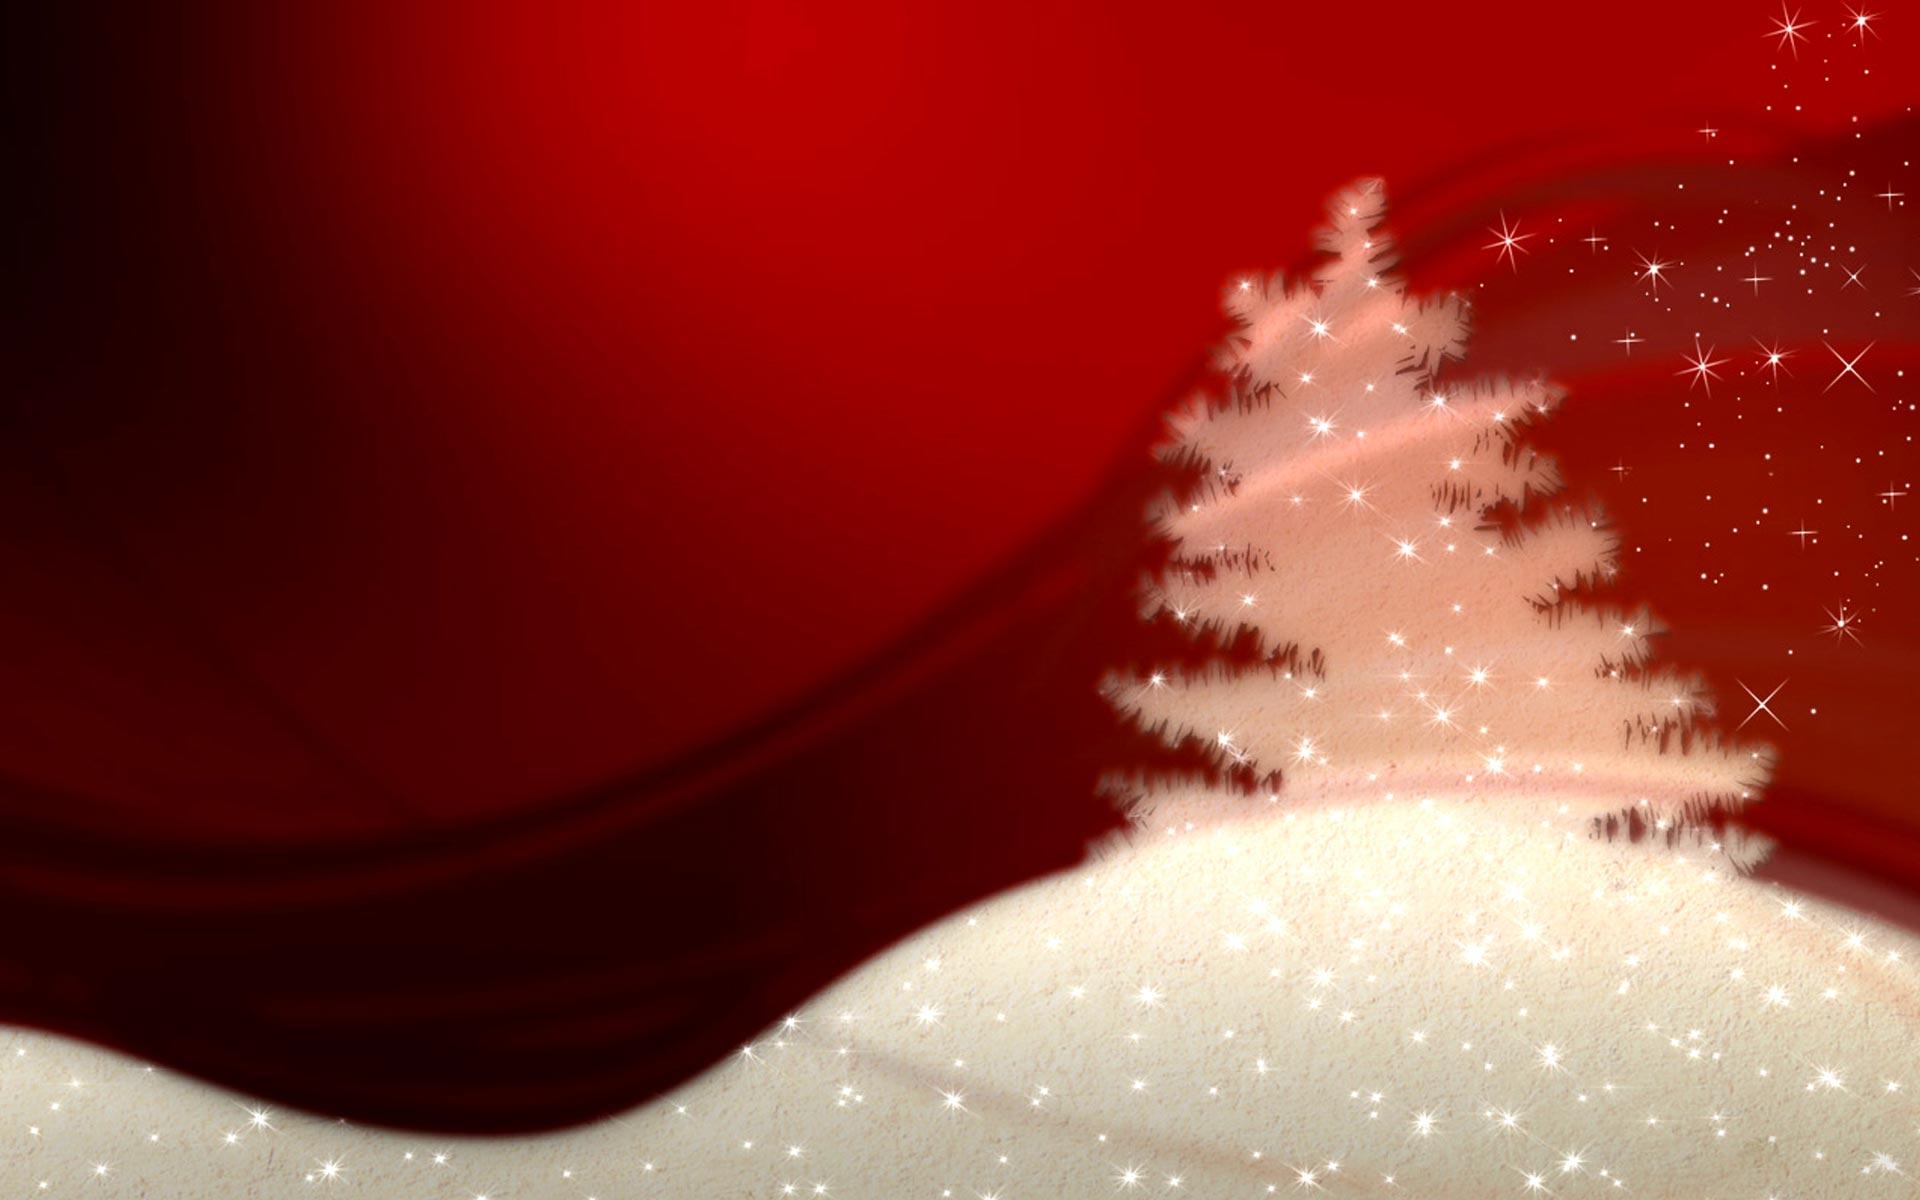 Christmas Background For Desktop Group (0+)